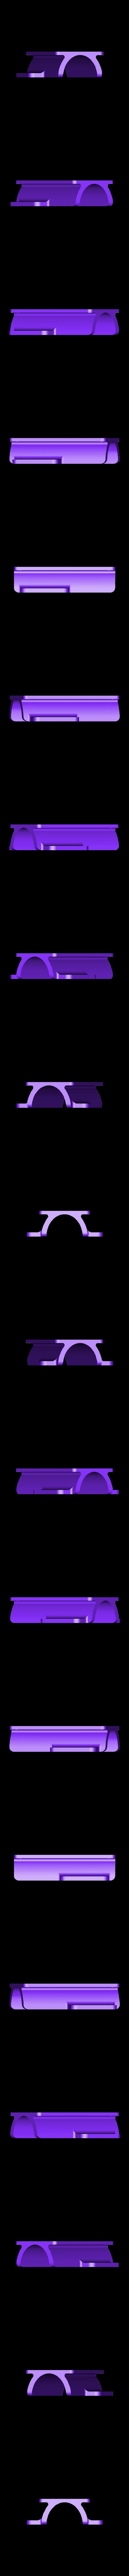 Corps2.stl Télécharger fichier STL Support Batterie Xiaomi M365 /Holder Battery Xiaomi • Objet imprimable en 3D, Spelth